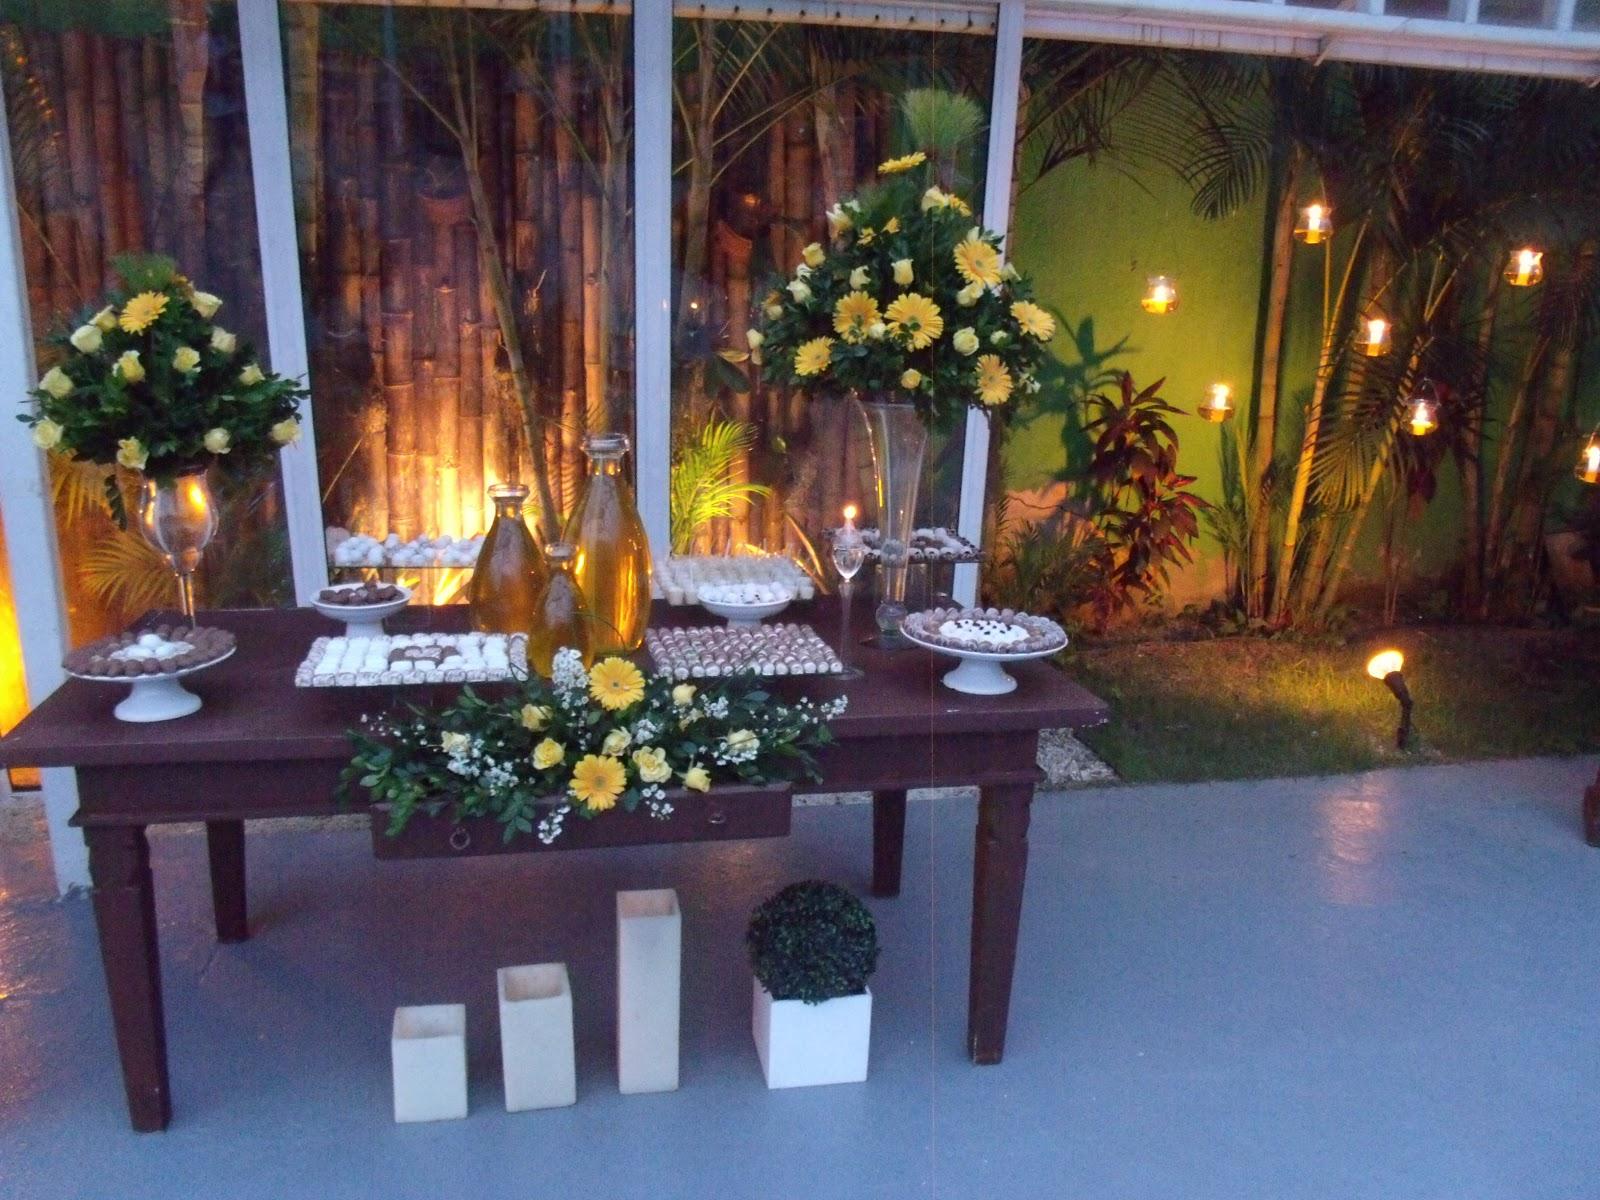 decoracao casamento rustico azul e amarelo : decoracao casamento rustico azul e amarelo: Magia Festas: Evento próprio – Casamento rústico amarelo e branco